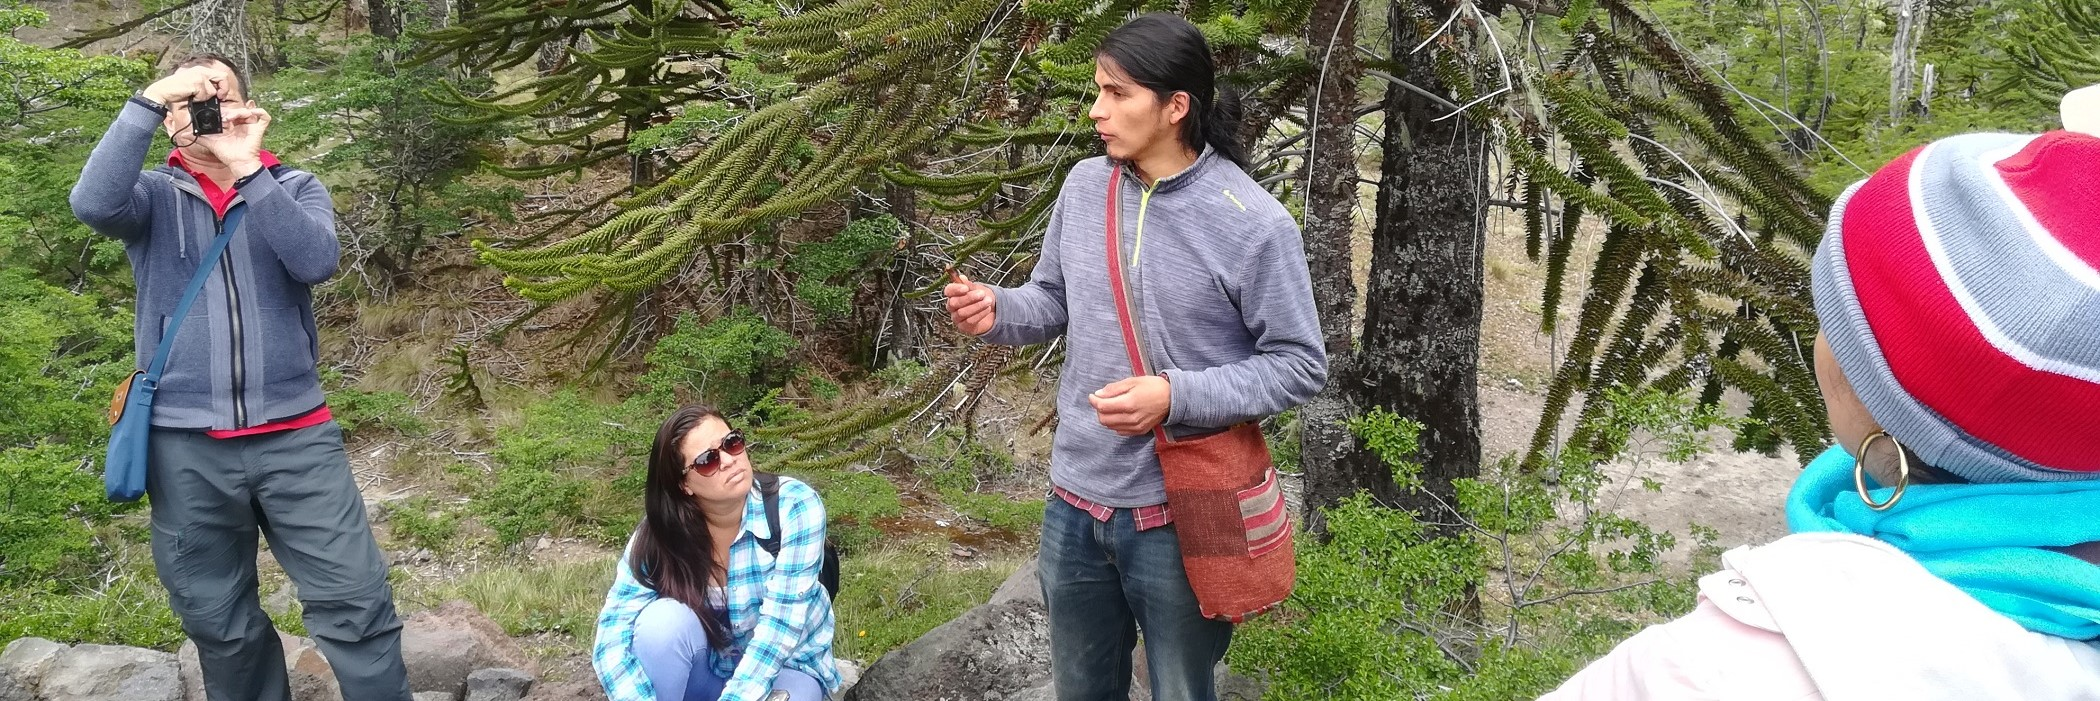 Caminata interpretativa entre araucarias